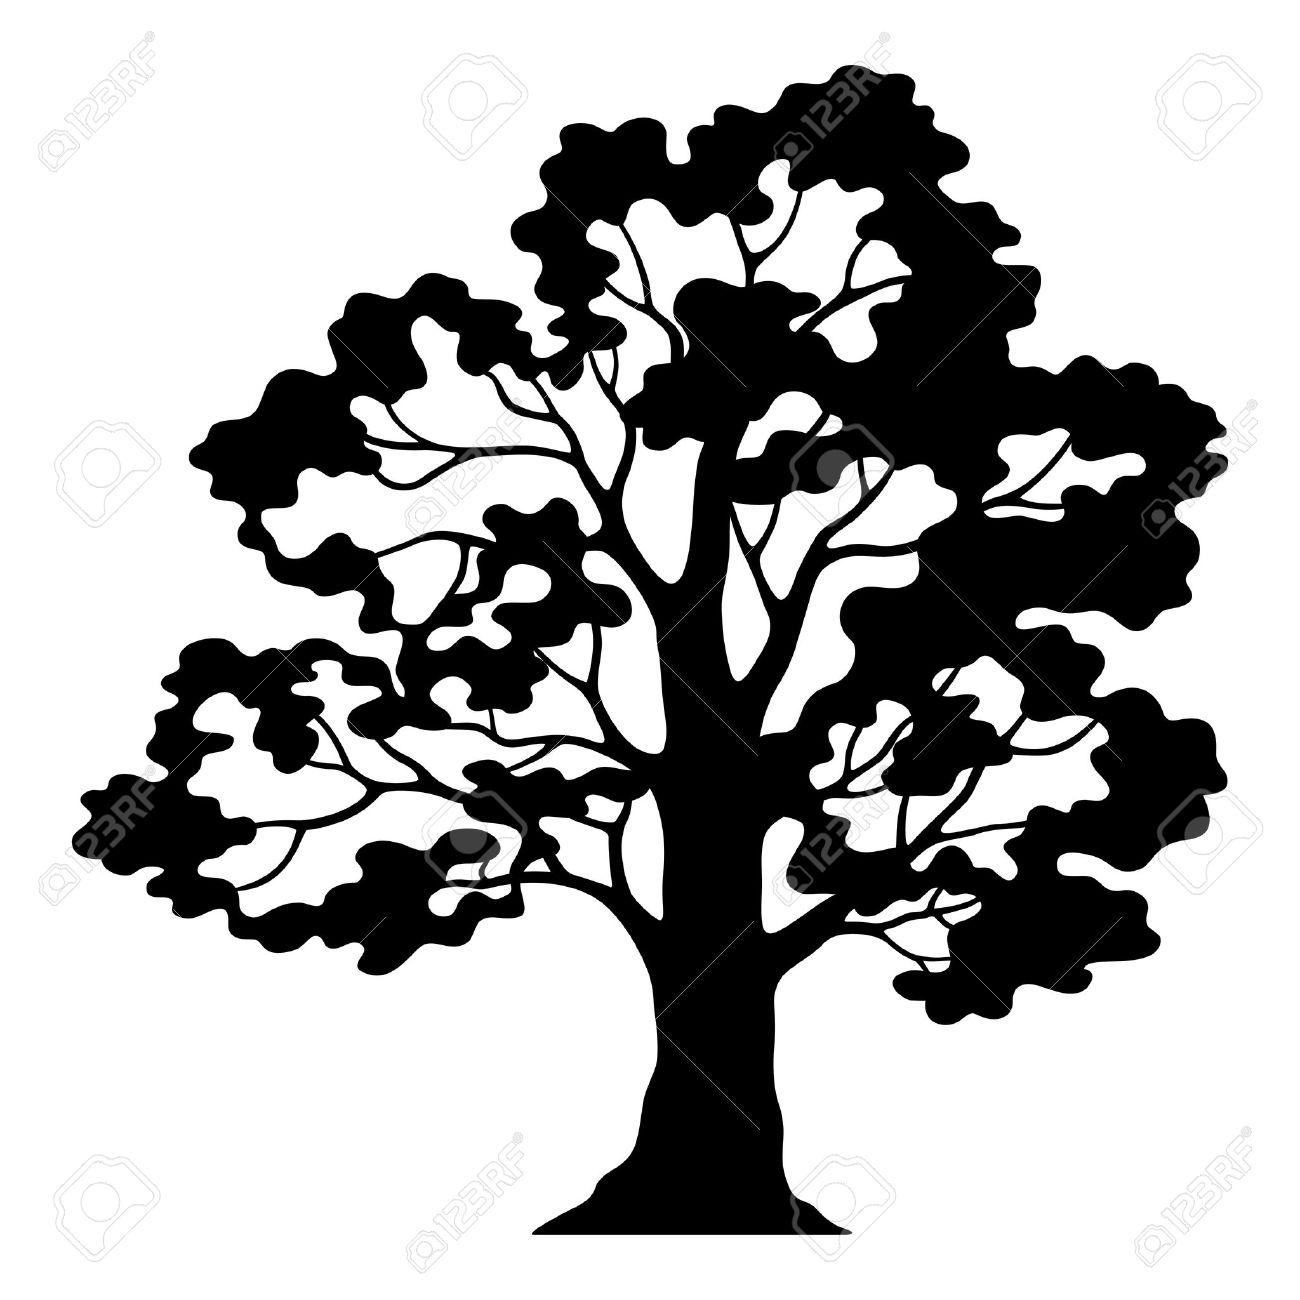 winter tree silhouette clip art at getdrawings com free for rh getdrawings com